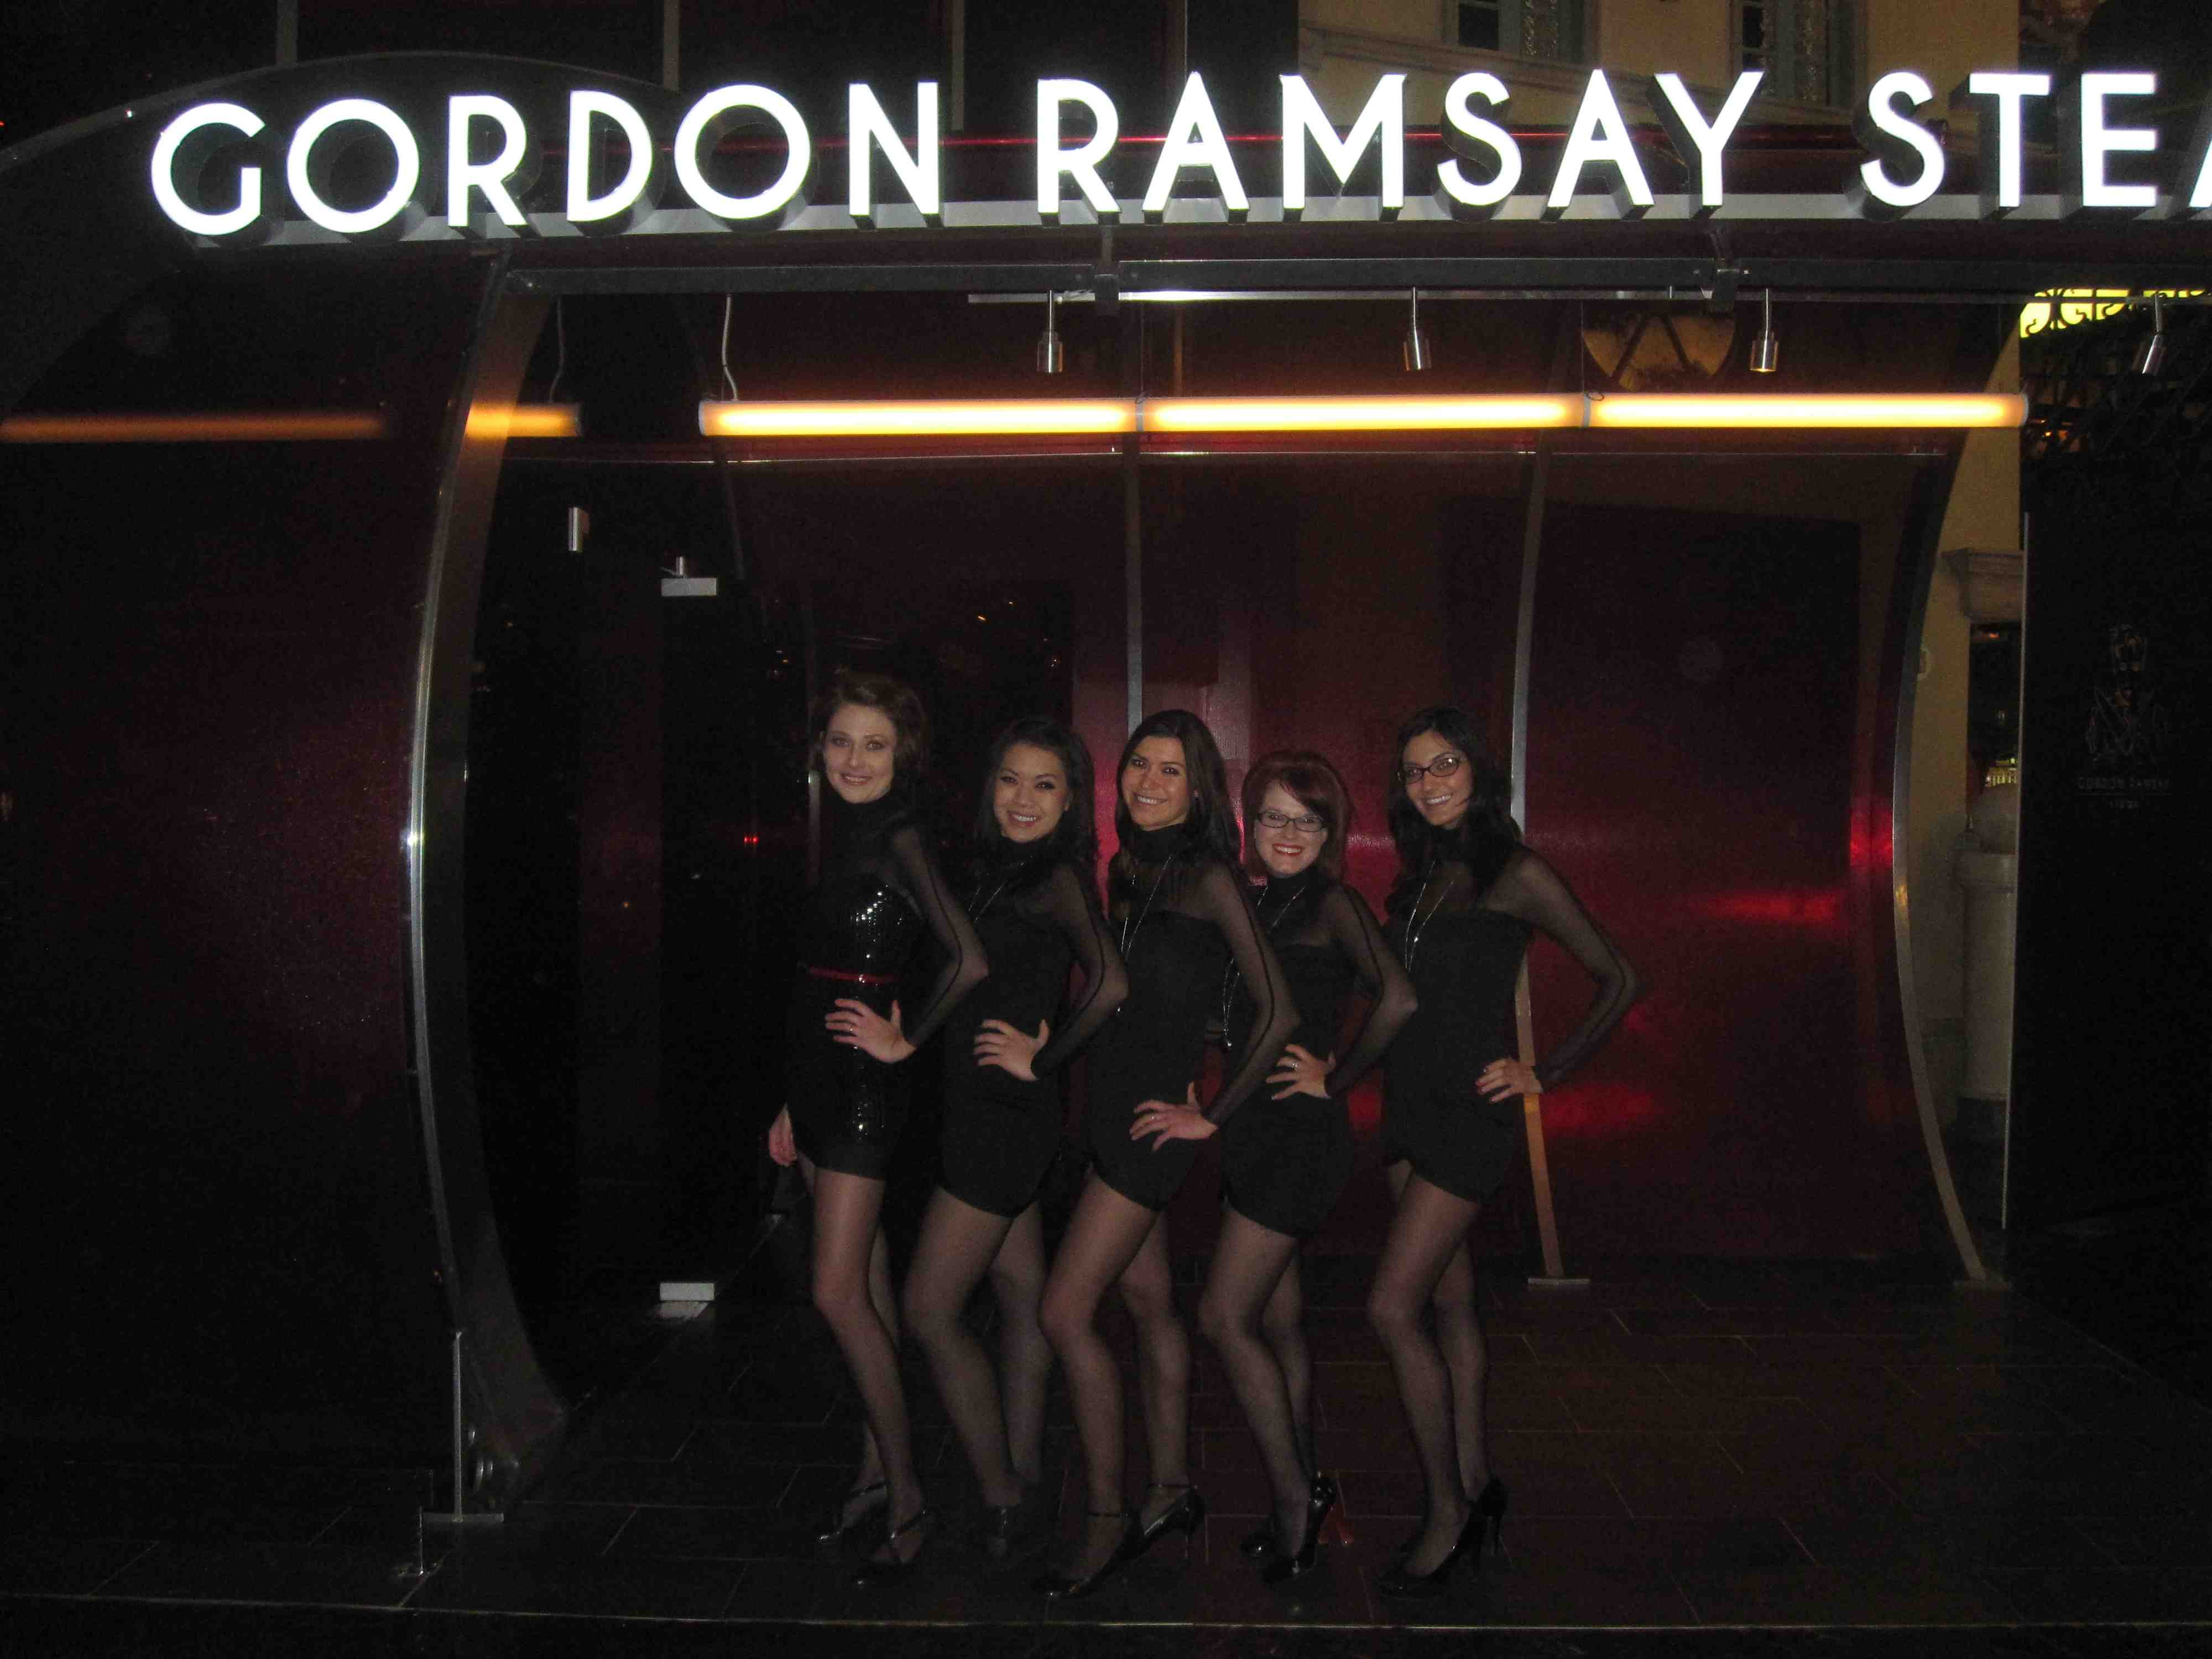 photos dagger in garter belt gordon ramsay steak uniforms dazzle